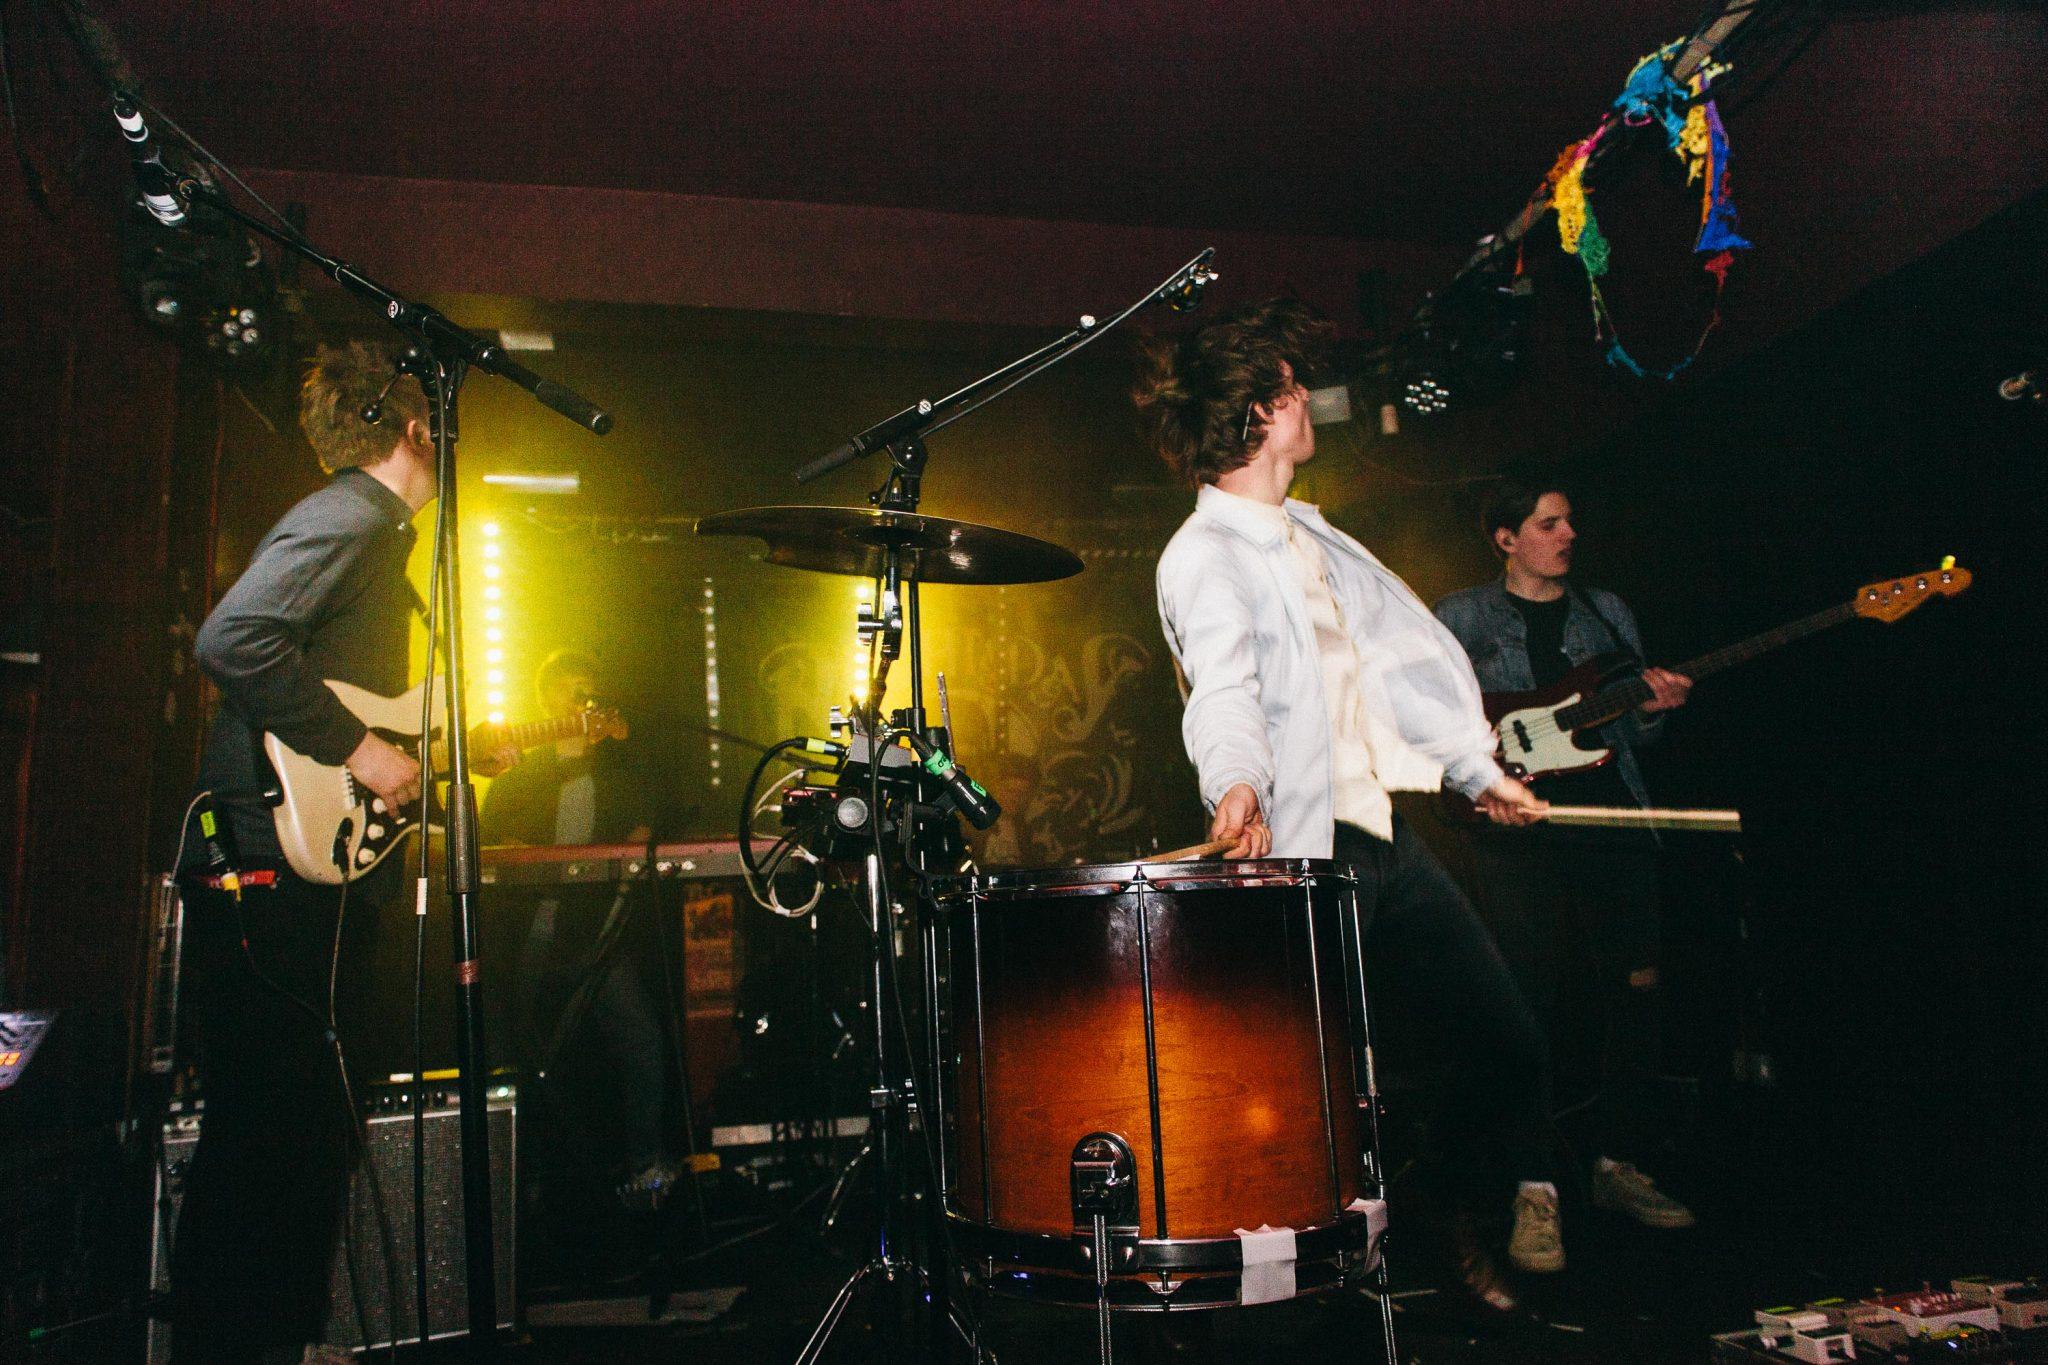 manchester london music photographer giant rooks